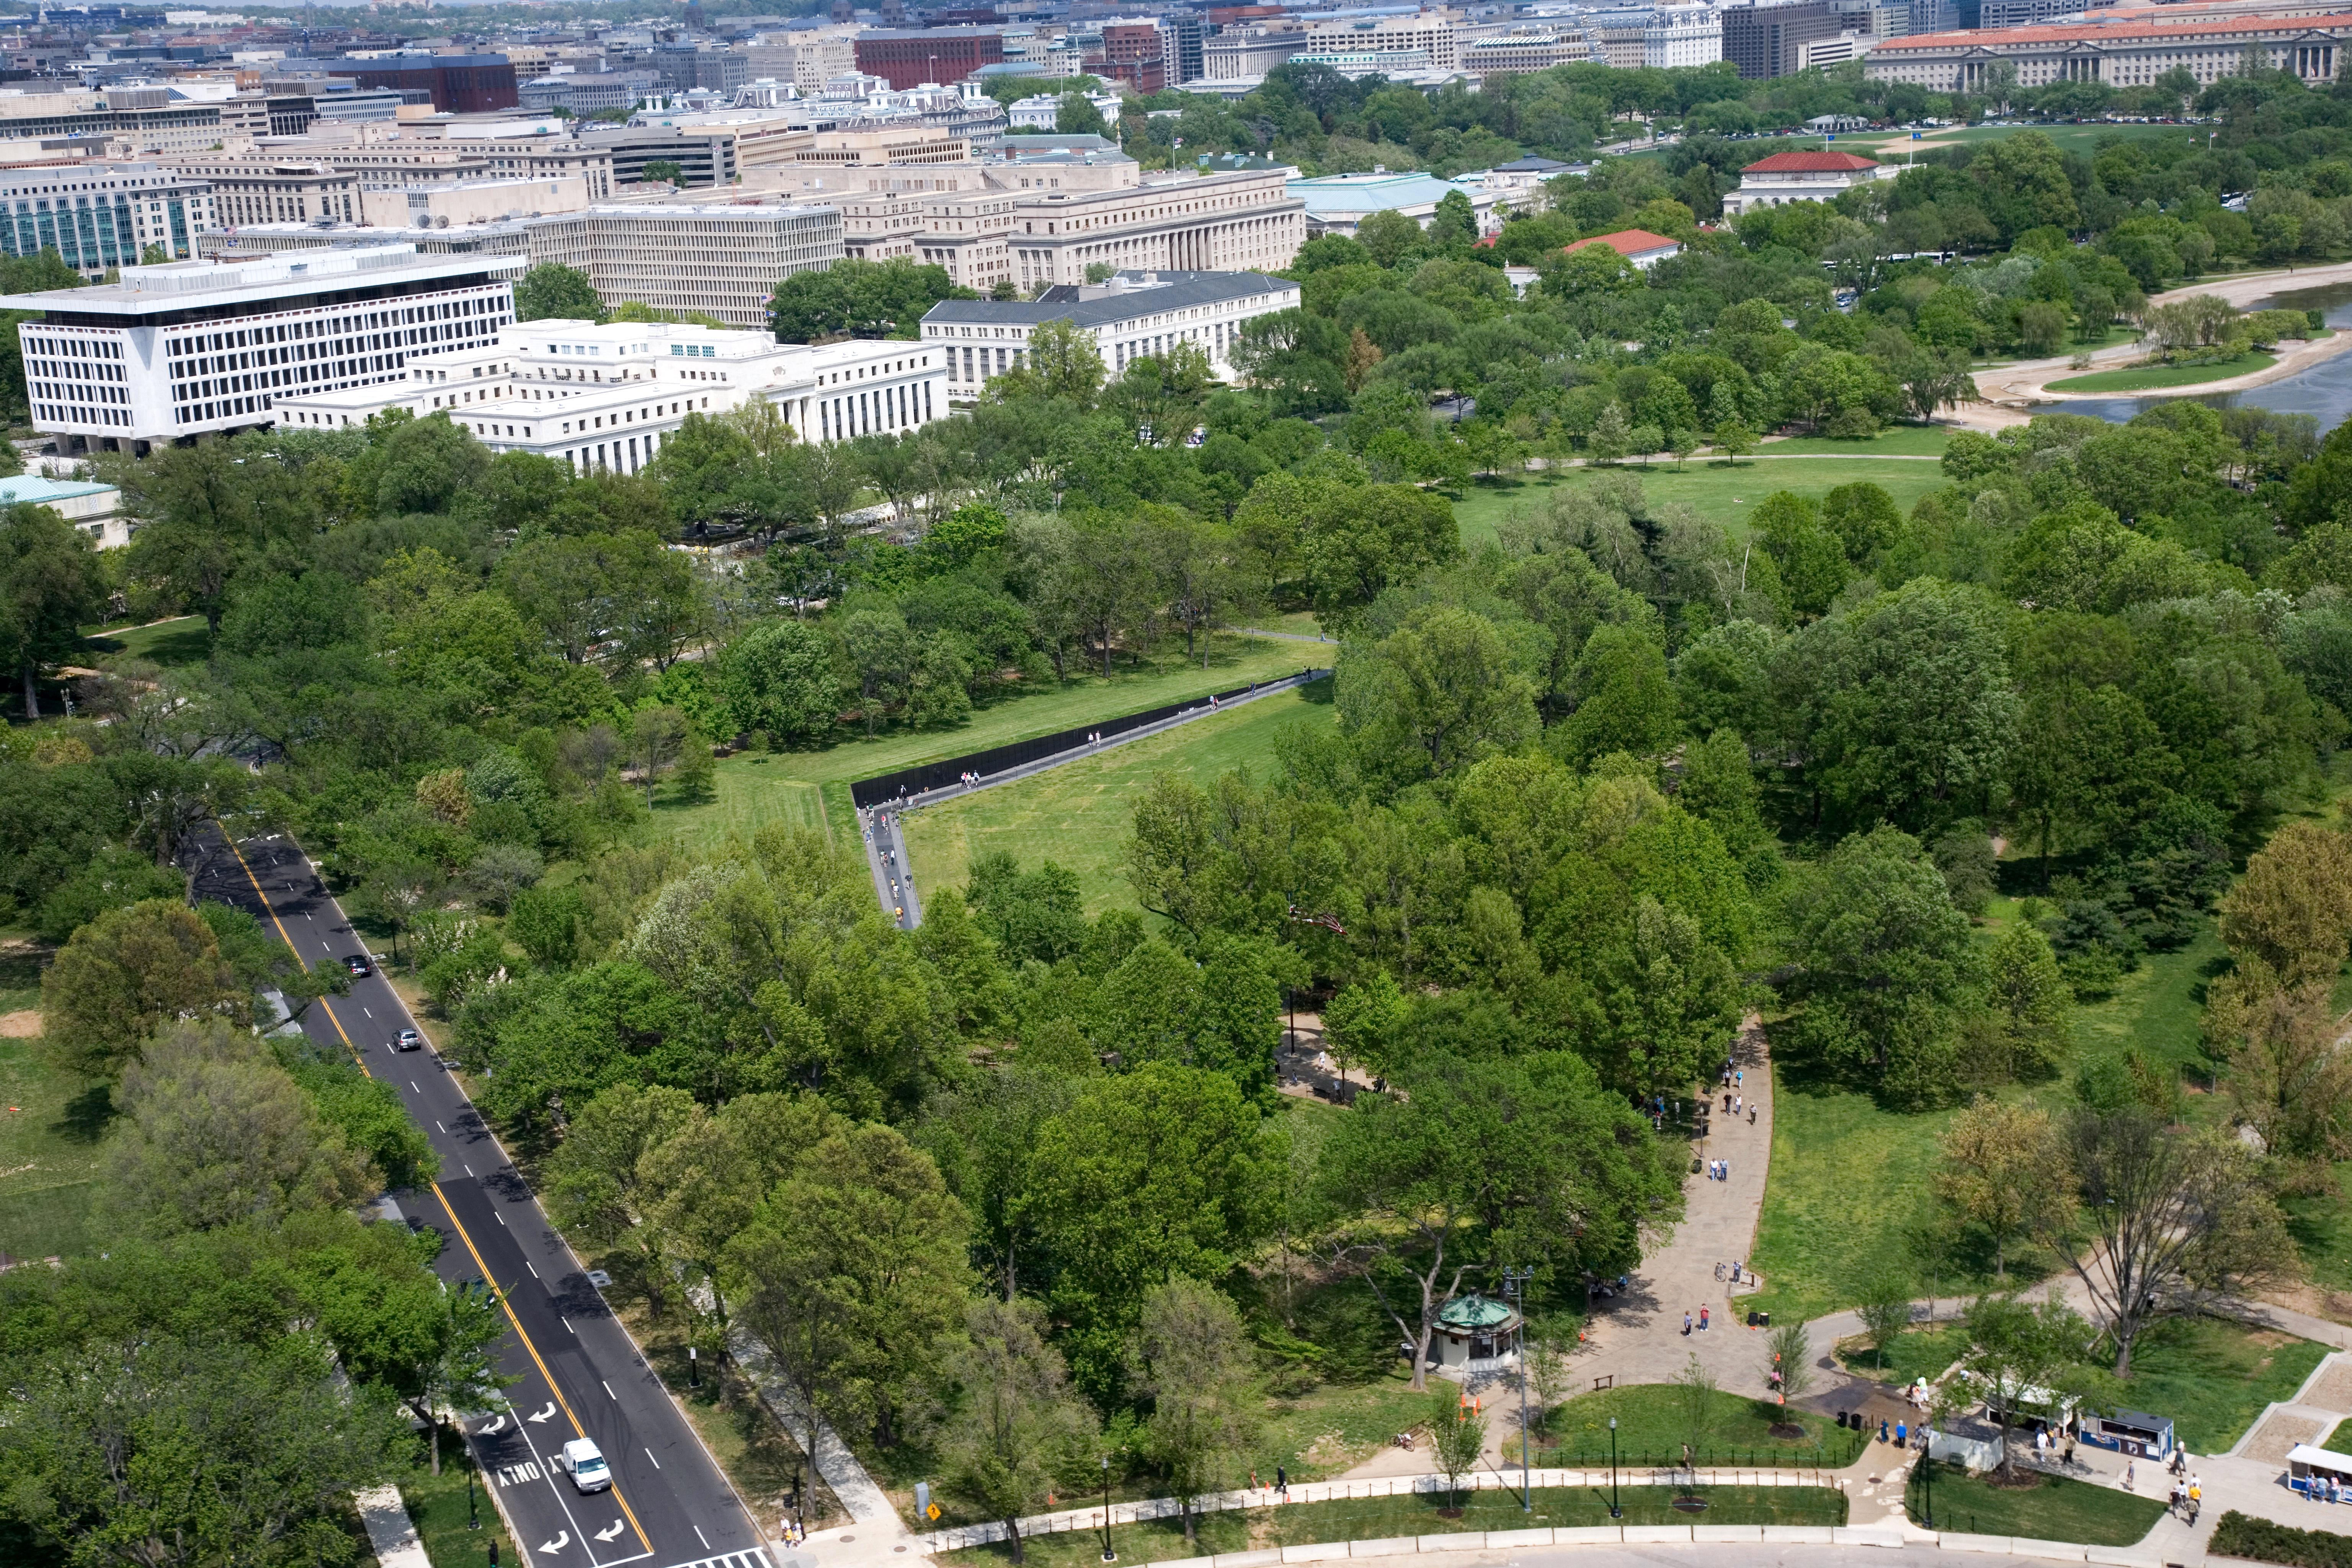 File:Aerial view of Vietnam Veterans Memorial.jpg - Wikimedia Commons